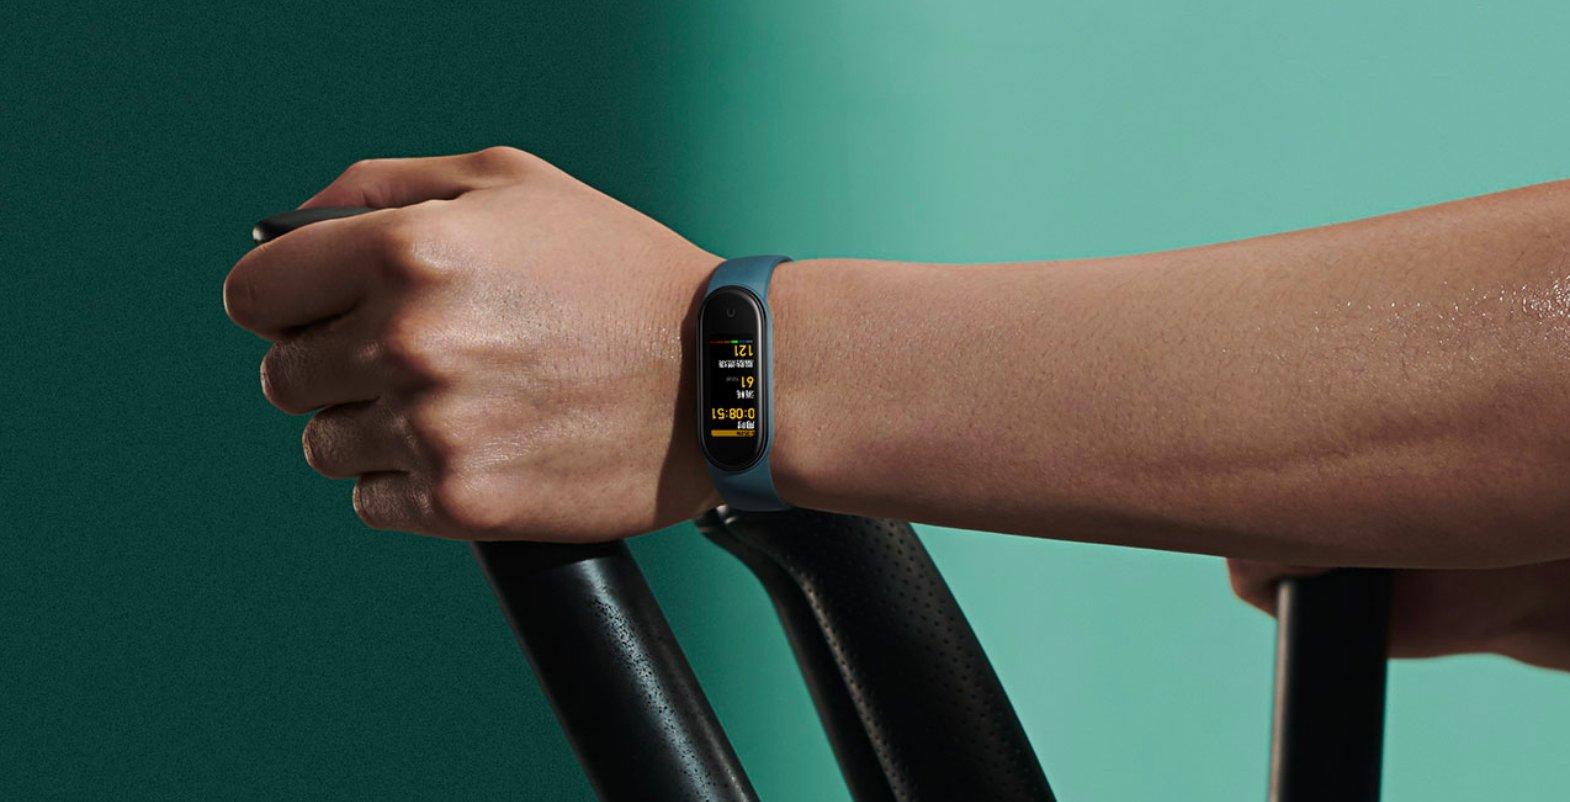 Mi Smart Band 5 watch price